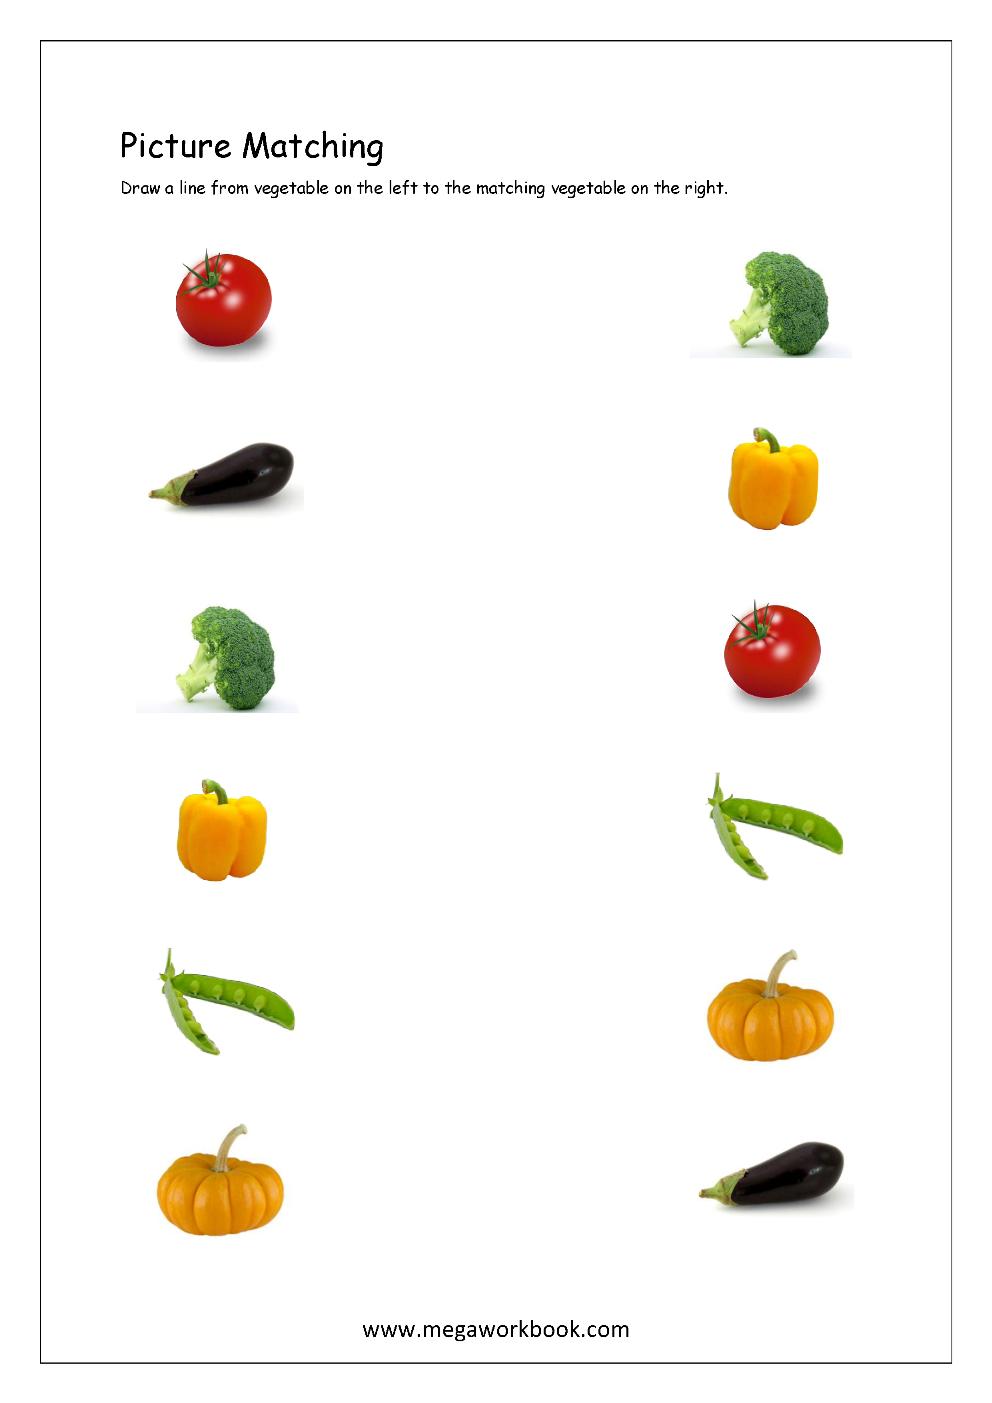 Matching Pictures Worksheets For Kindergarten